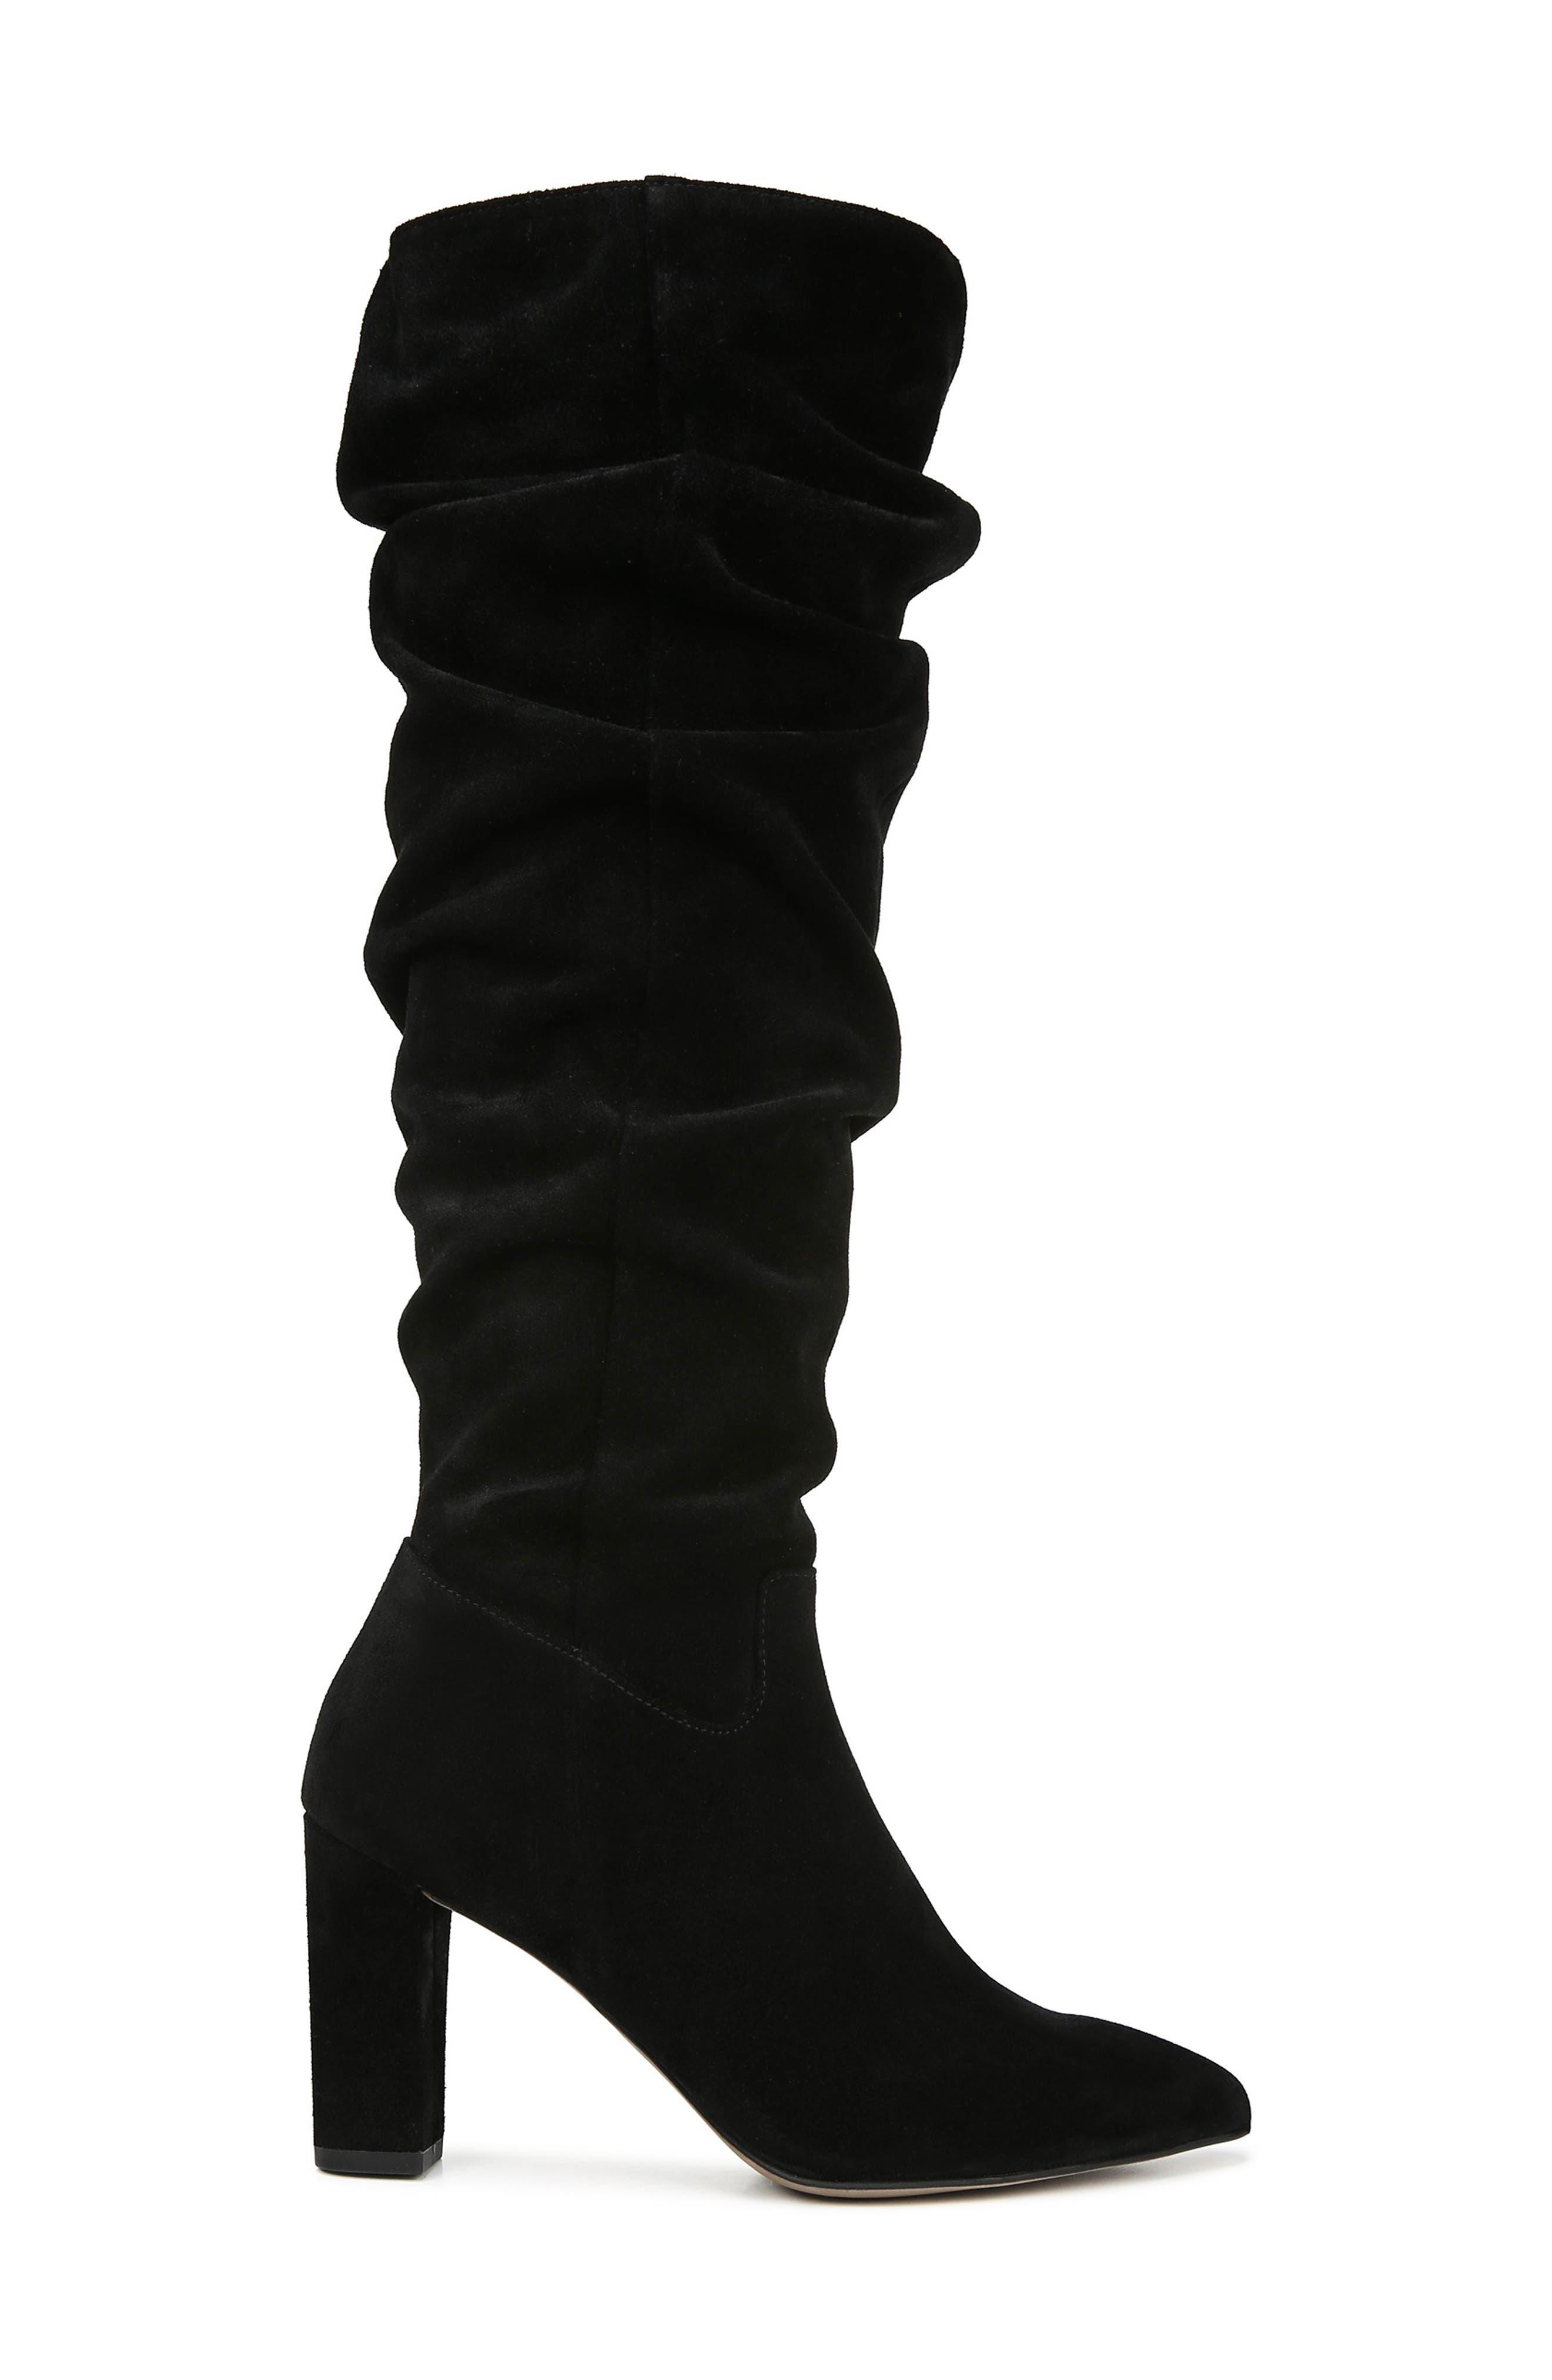 Artesia Knee High Boot,                             Alternate thumbnail 3, color,                             BLACK SUEDE